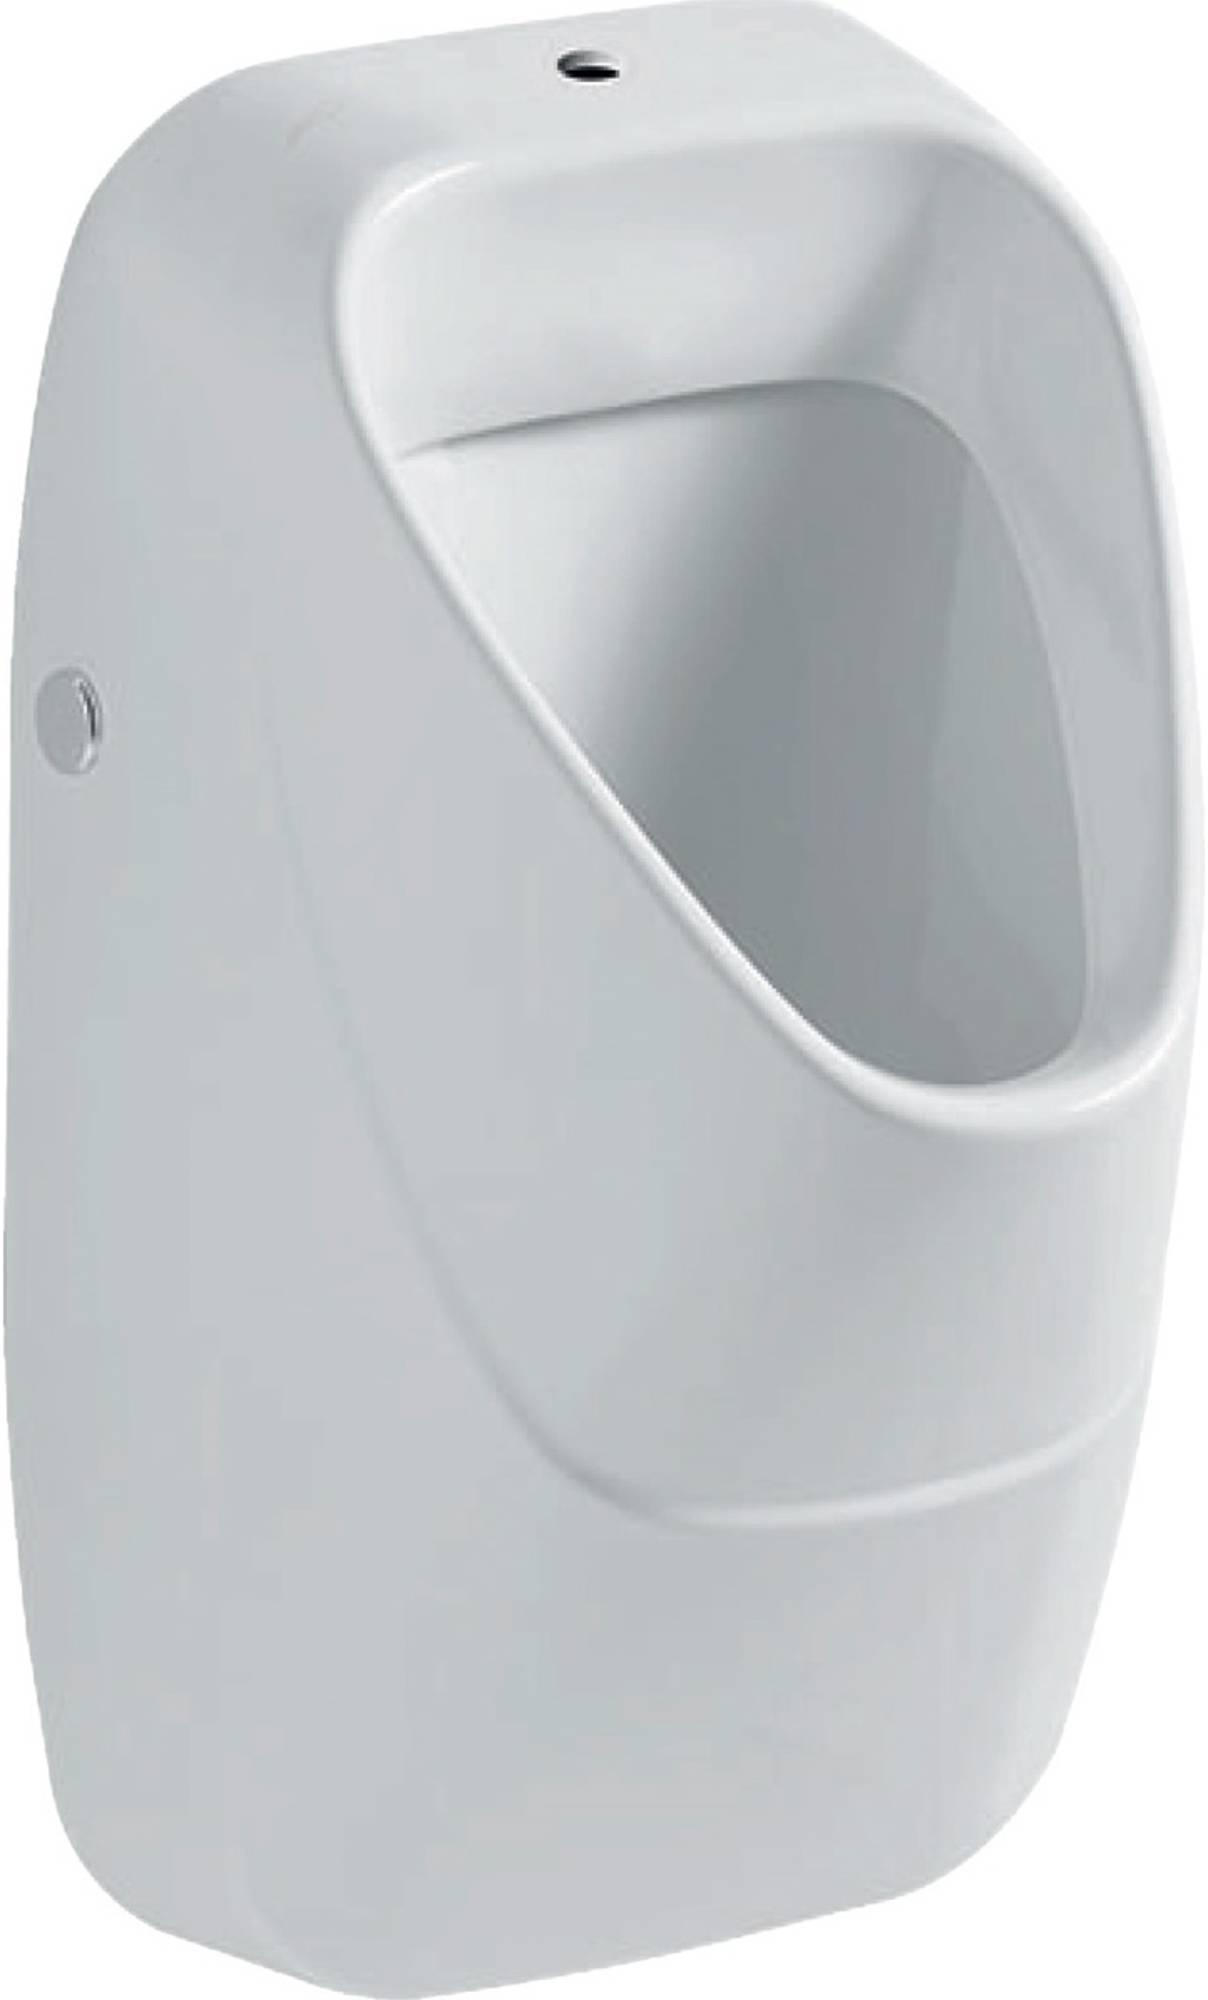 Geberit 300 Urinals Urinoir KeraTect 34x34x57 cm Wit